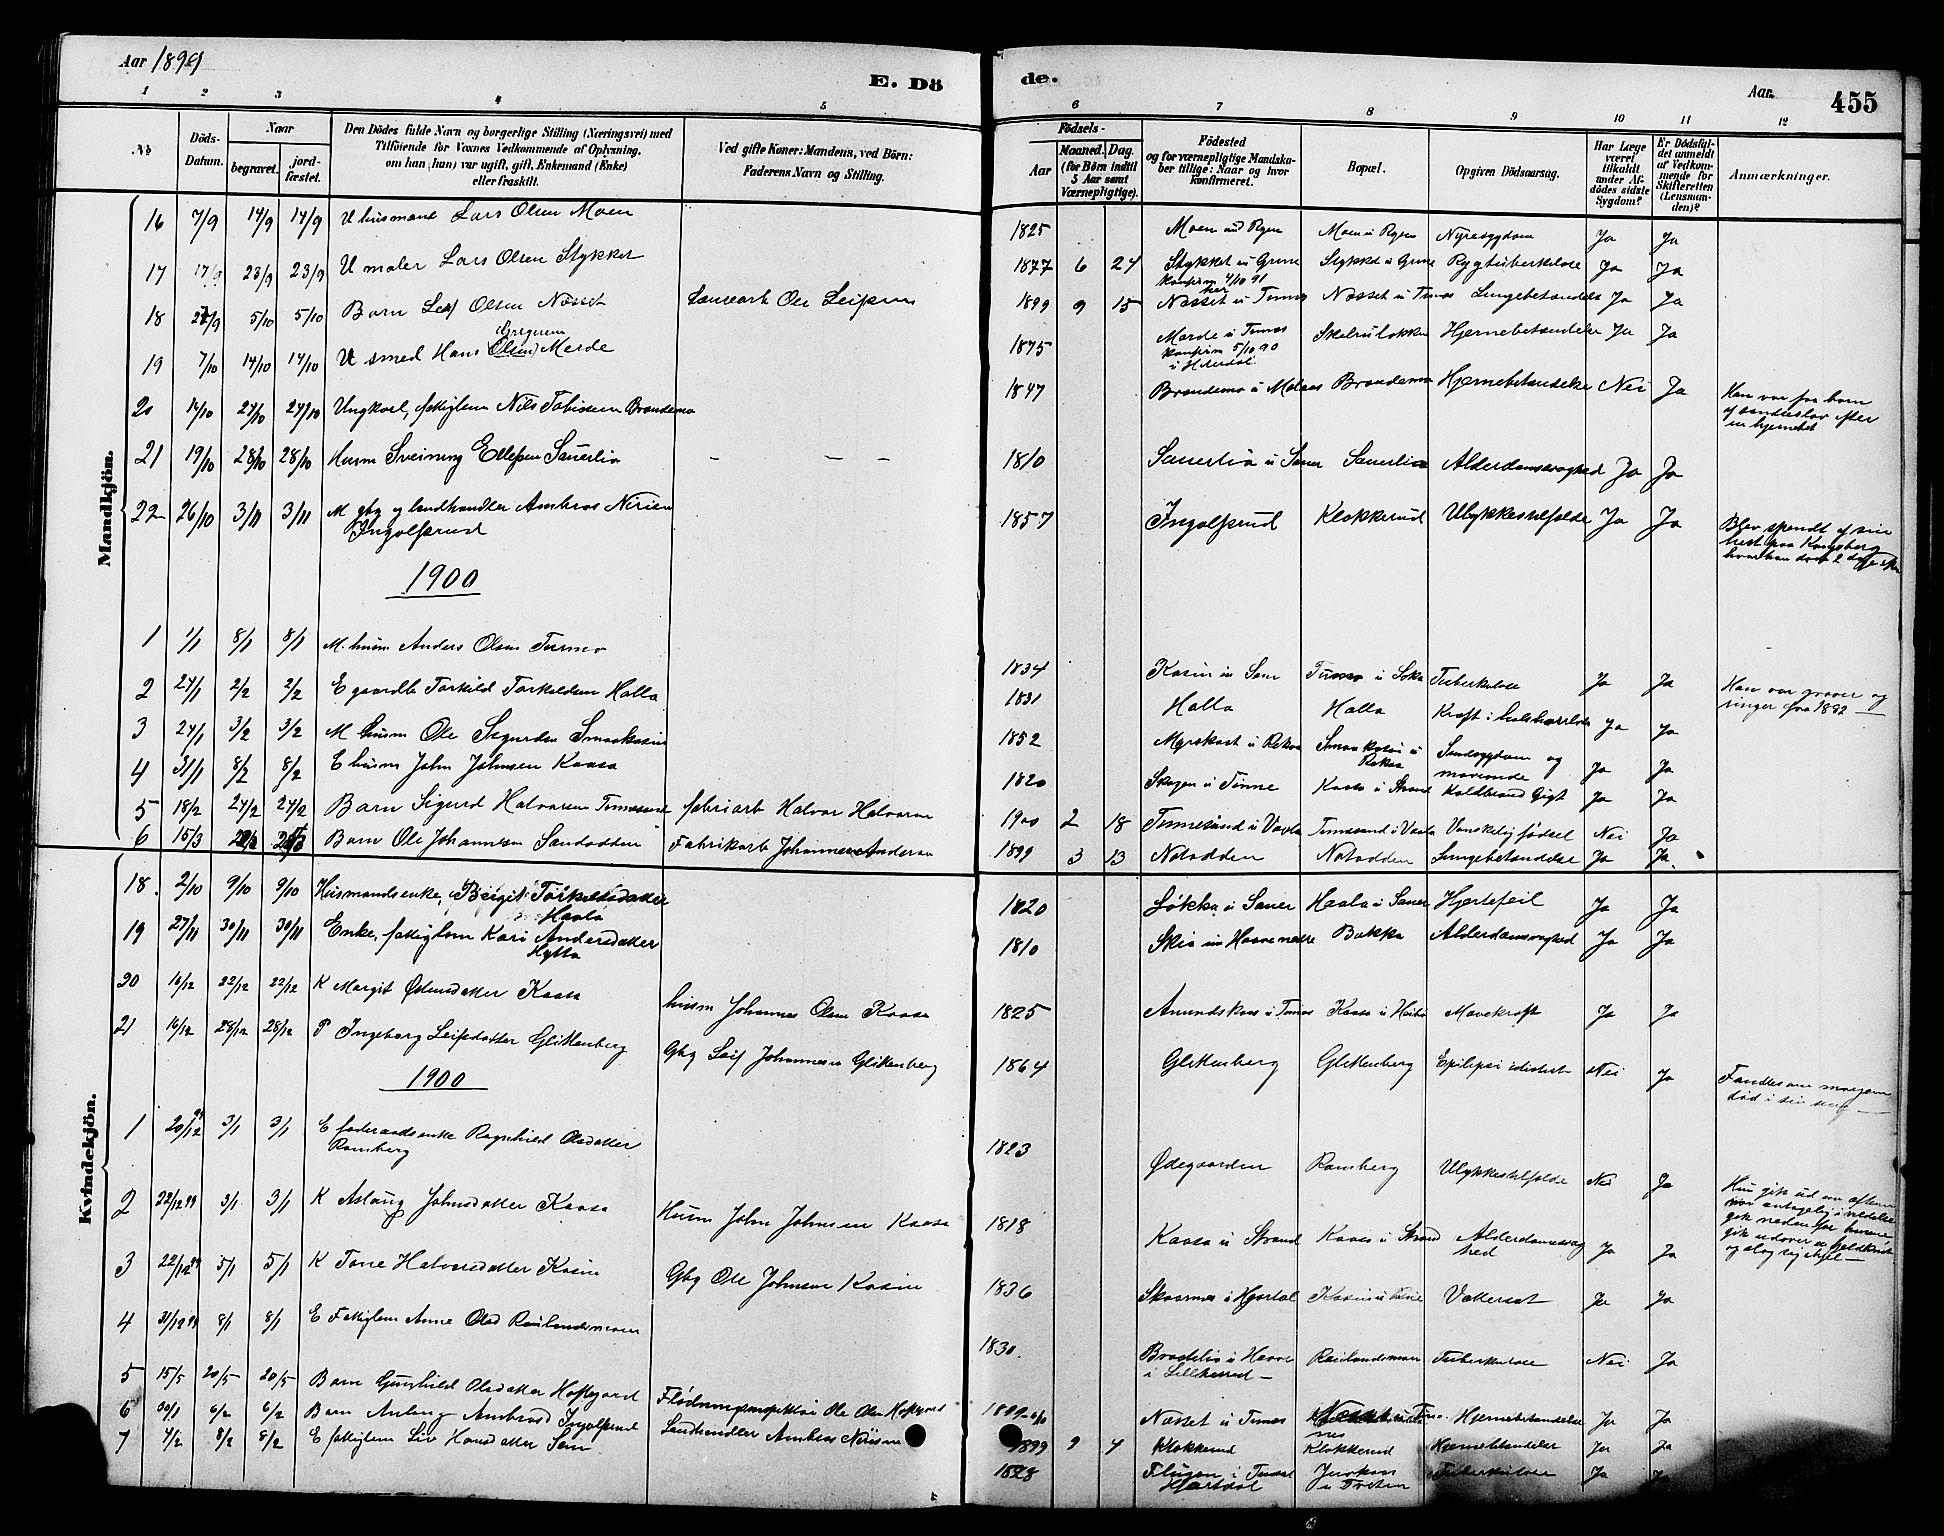 SAKO, Heddal kirkebøker, G/Ga/L0002: Klokkerbok nr. I 2, 1879-1908, s. 455